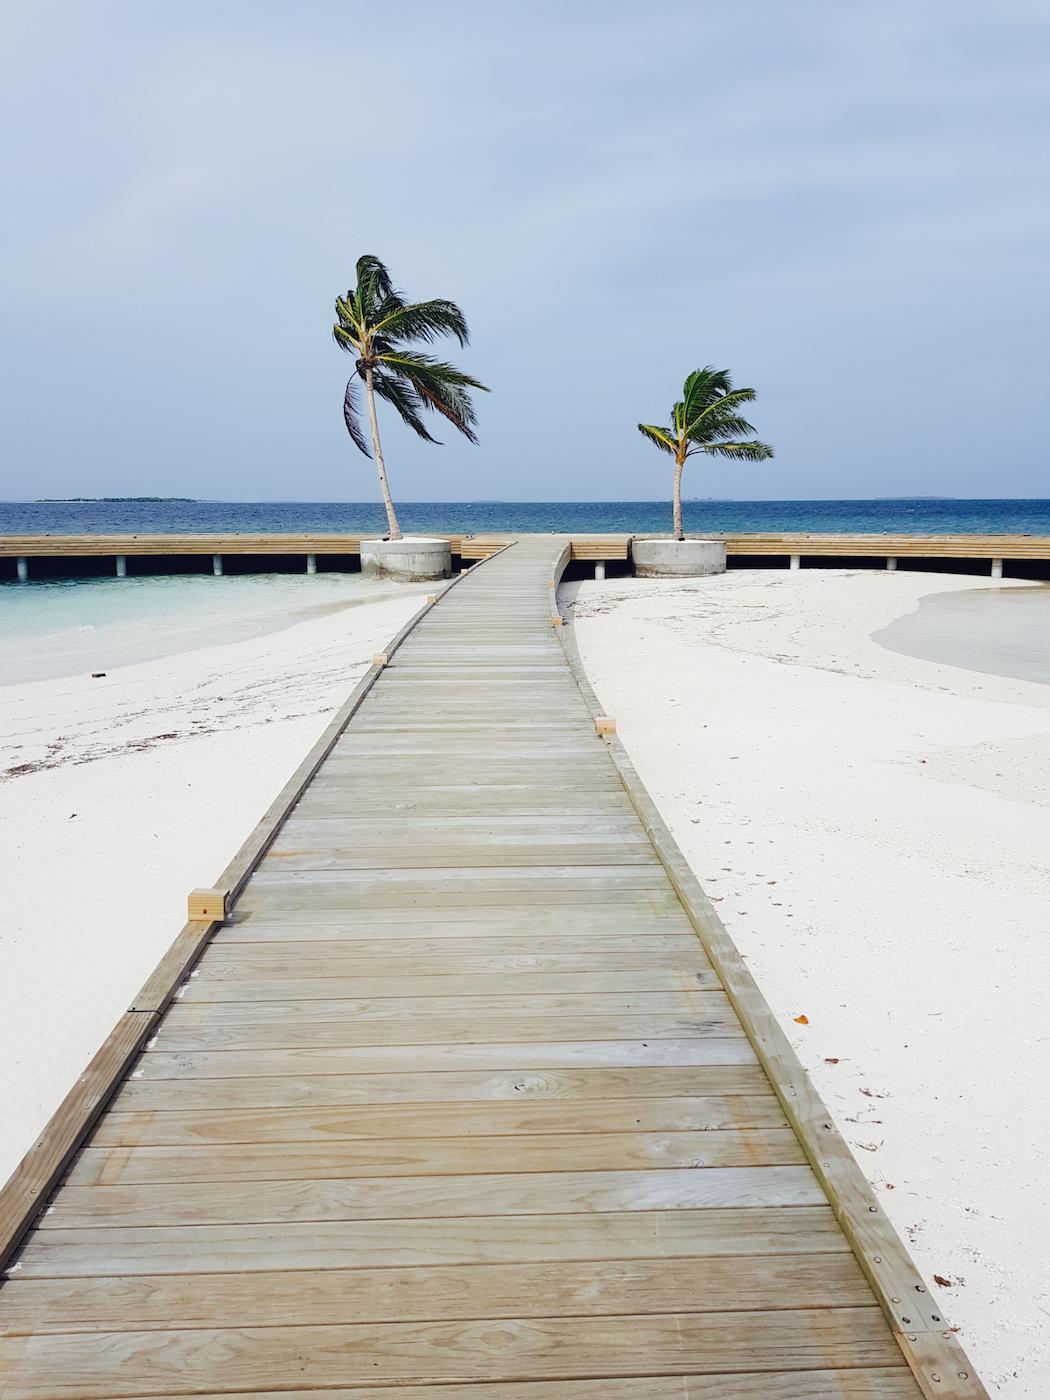 Dhigali Maldives, Maldives, Kat Lebrasse